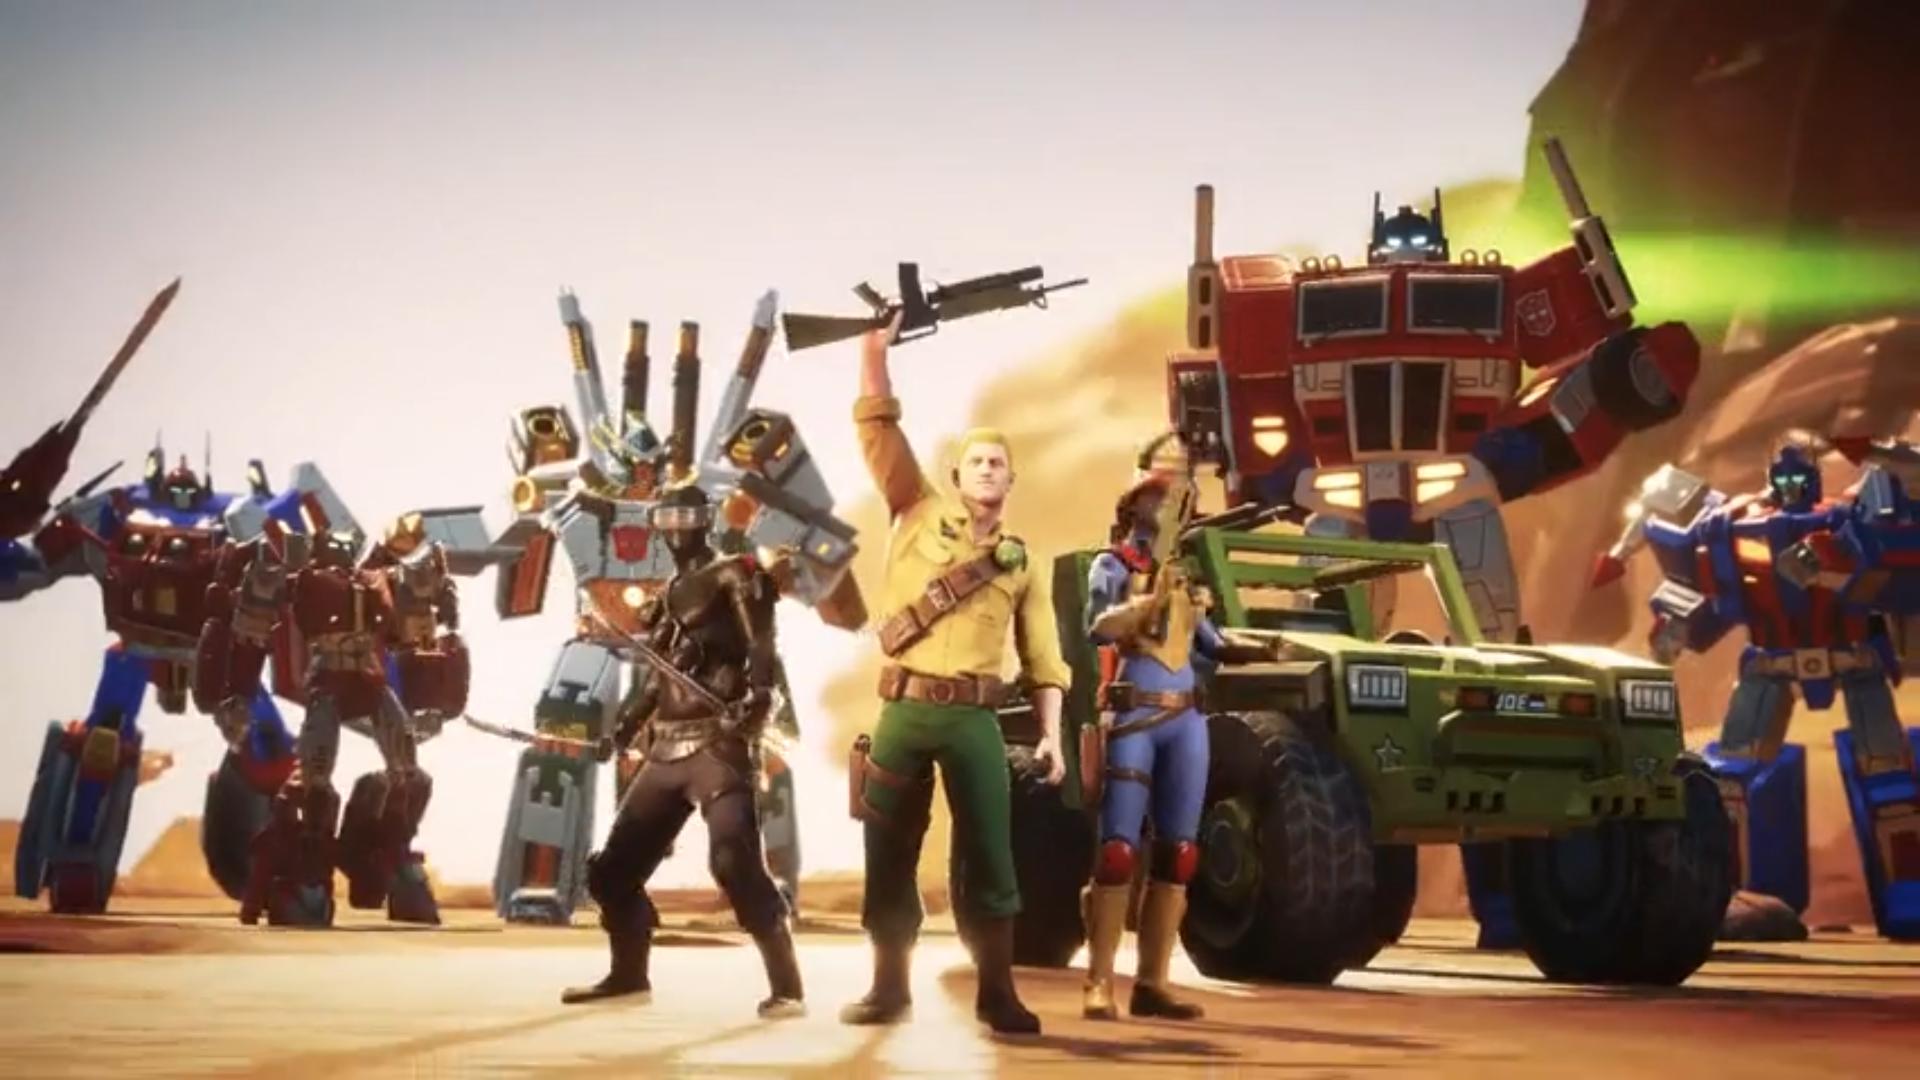 GI Joe Franchise Heading To Transformers Earth Wars Mobile Game 1920x1080